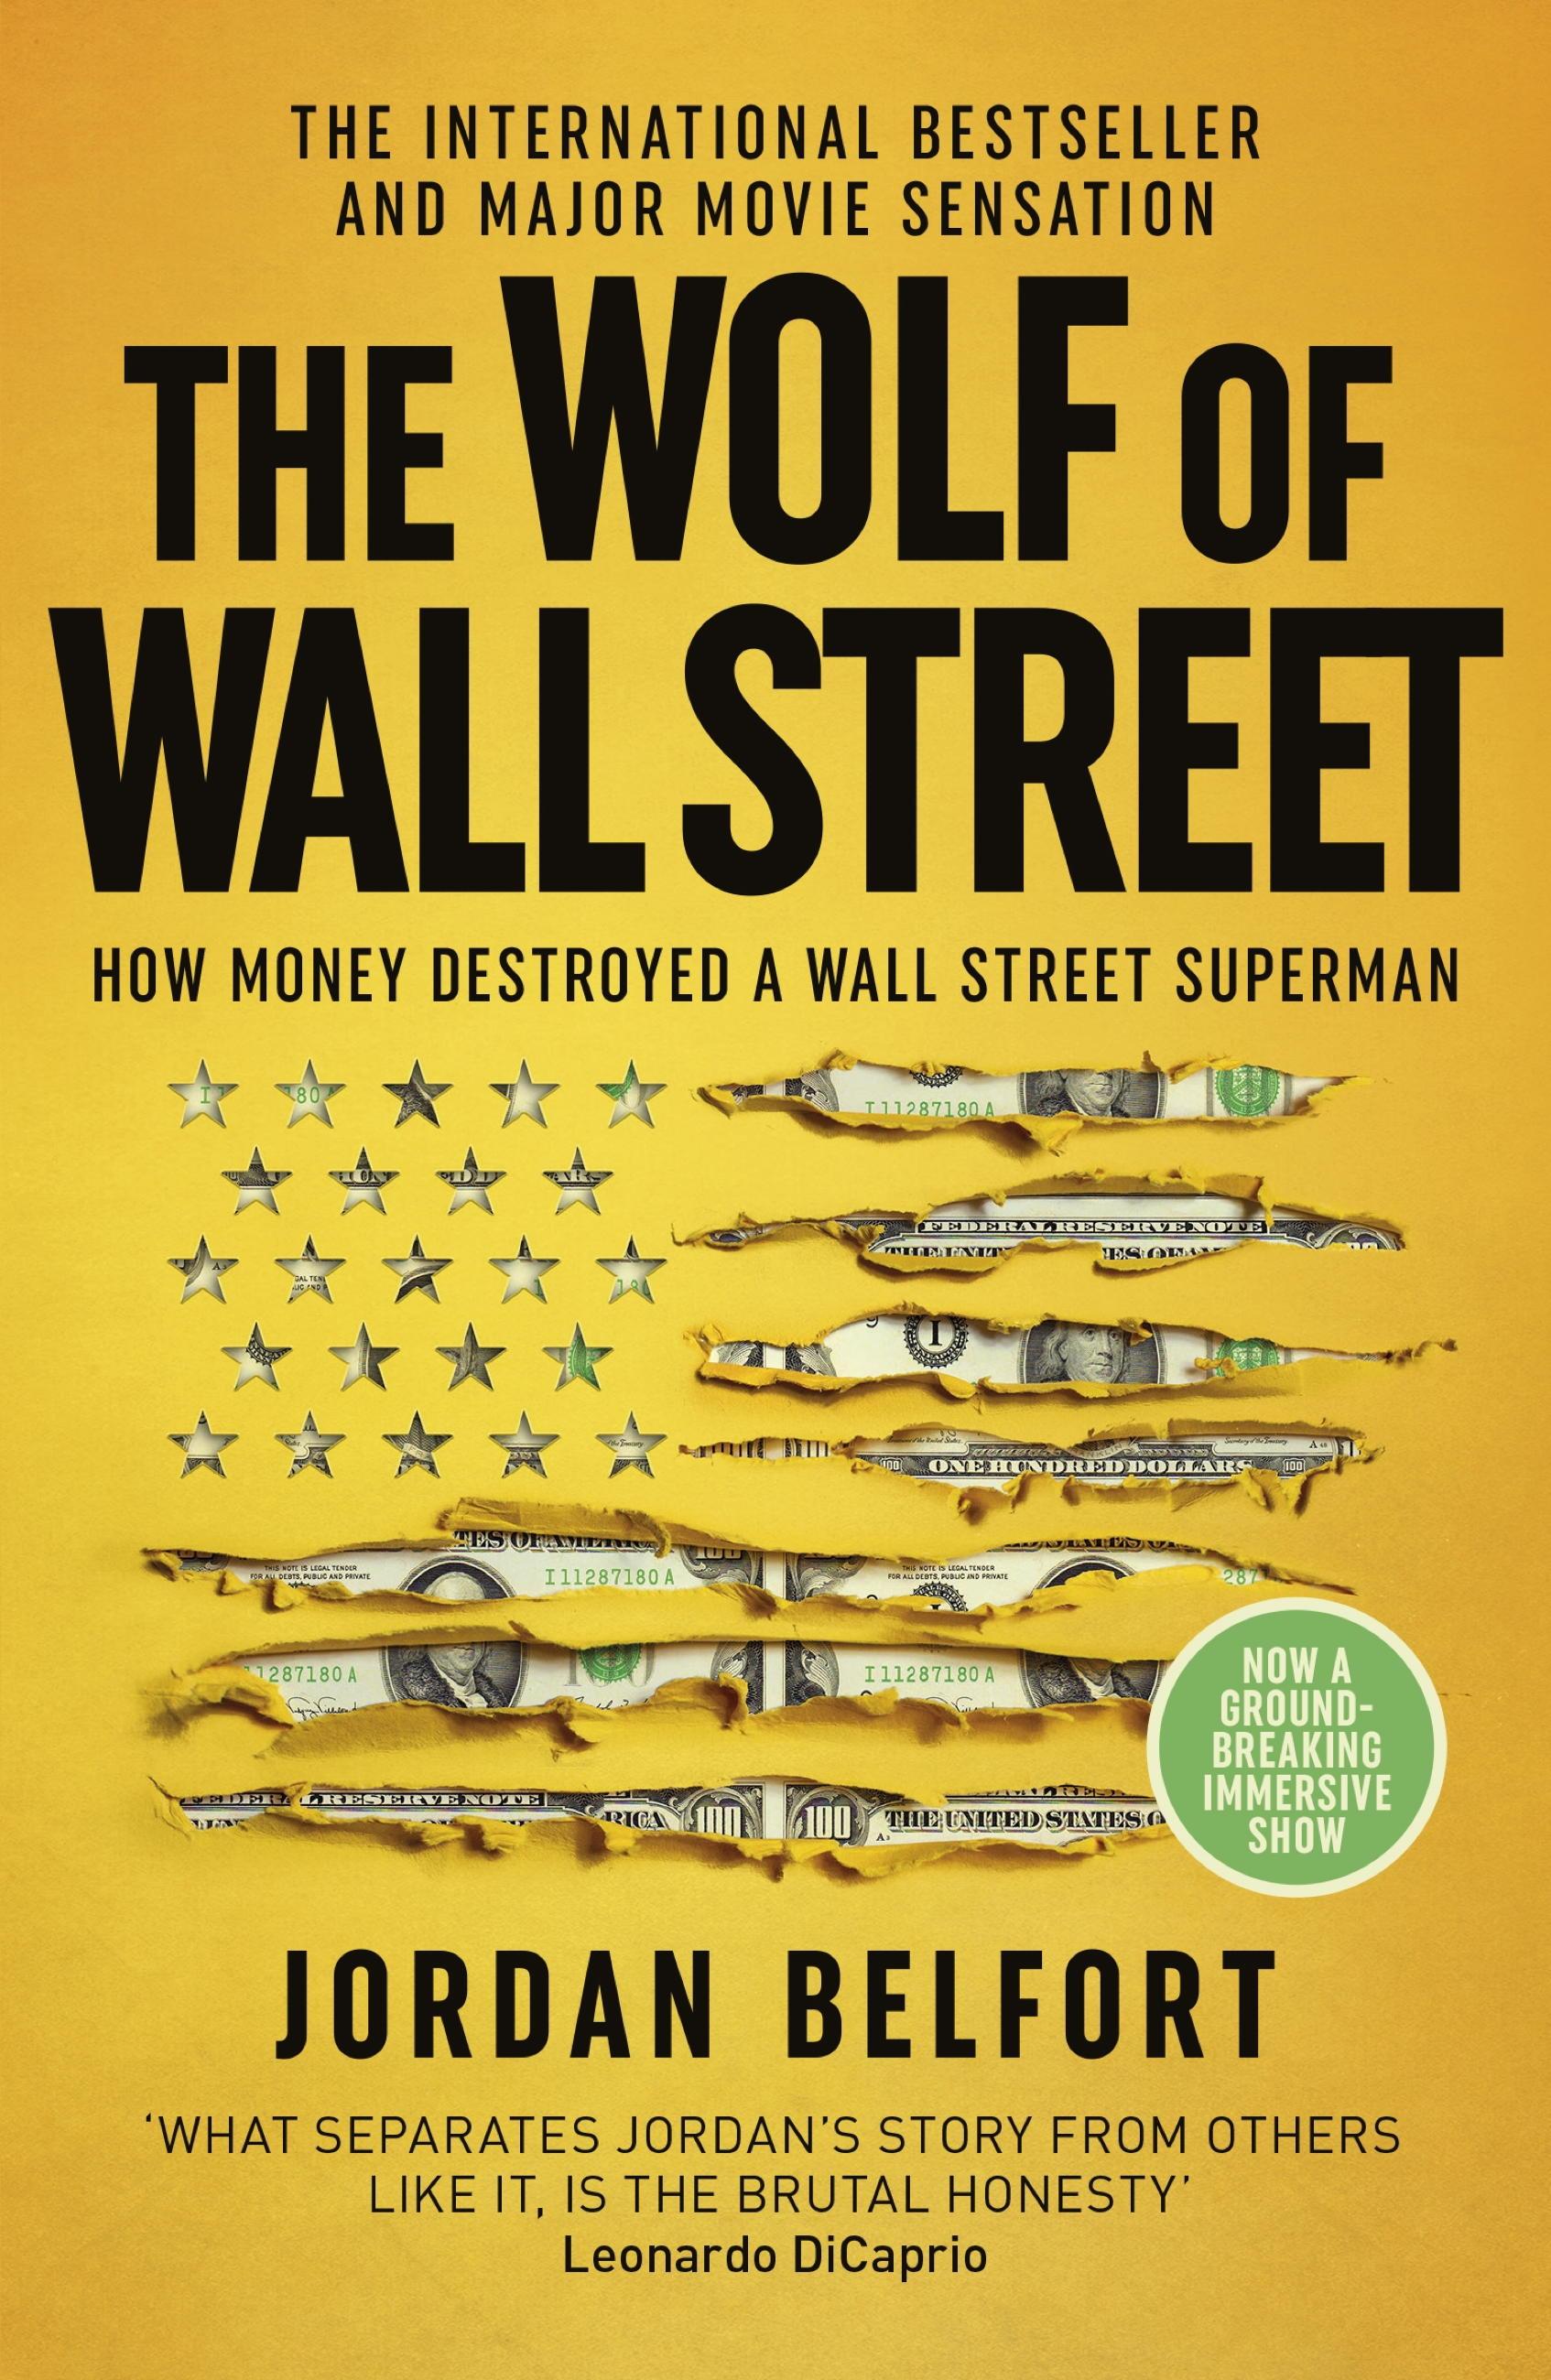 Download Ebook The Wolf of Wall Street by Jordan Belfort Pdf